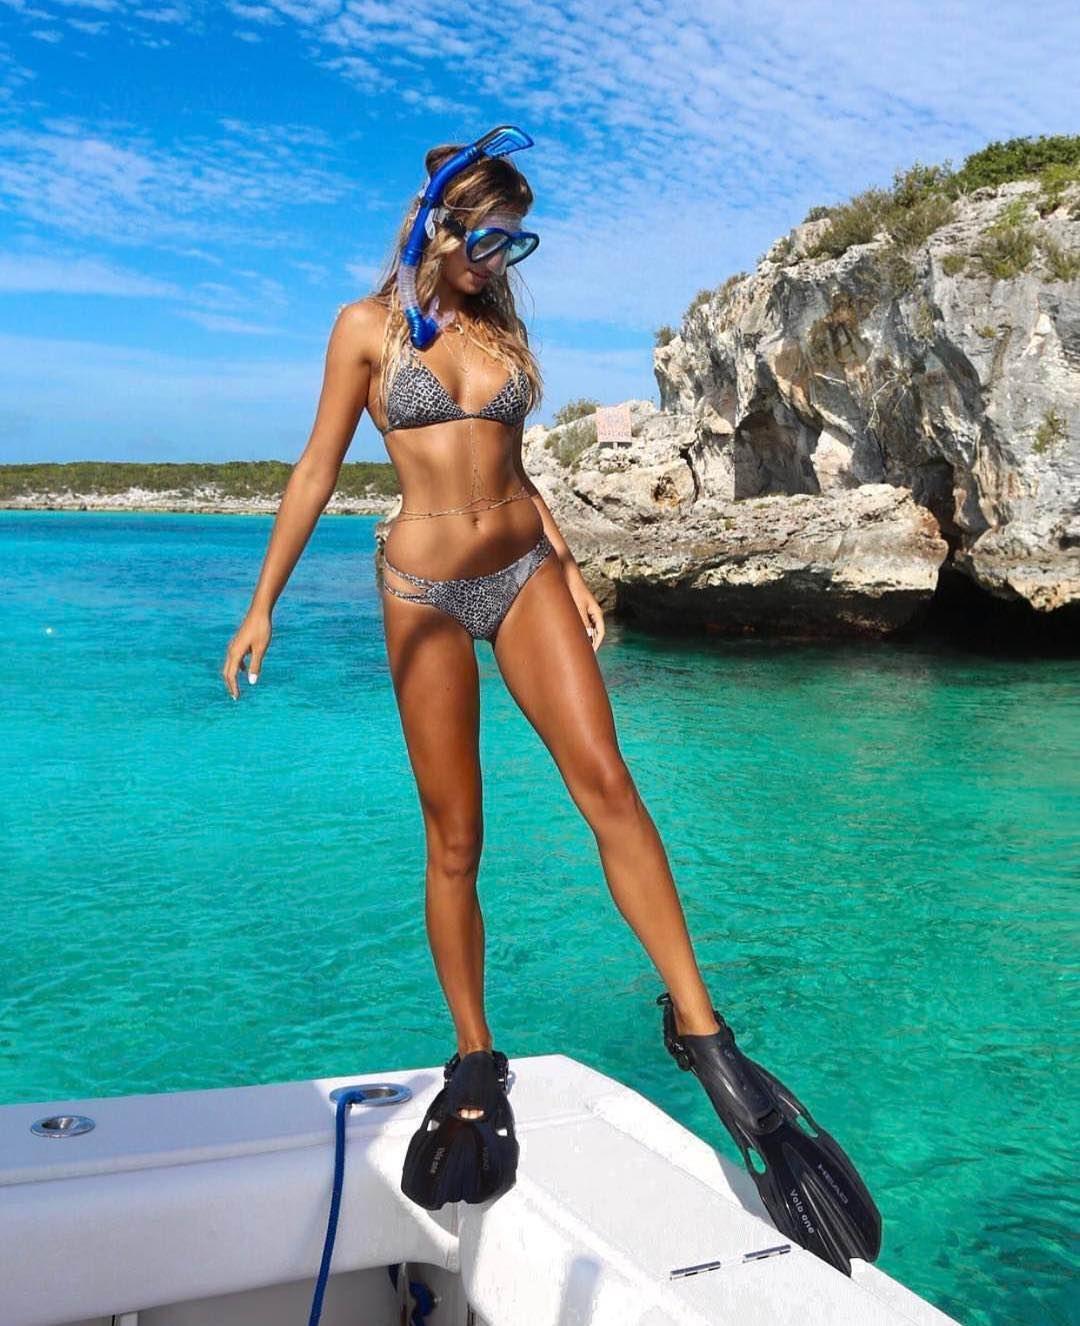 Девушка дня: путешественница Сара Кохан